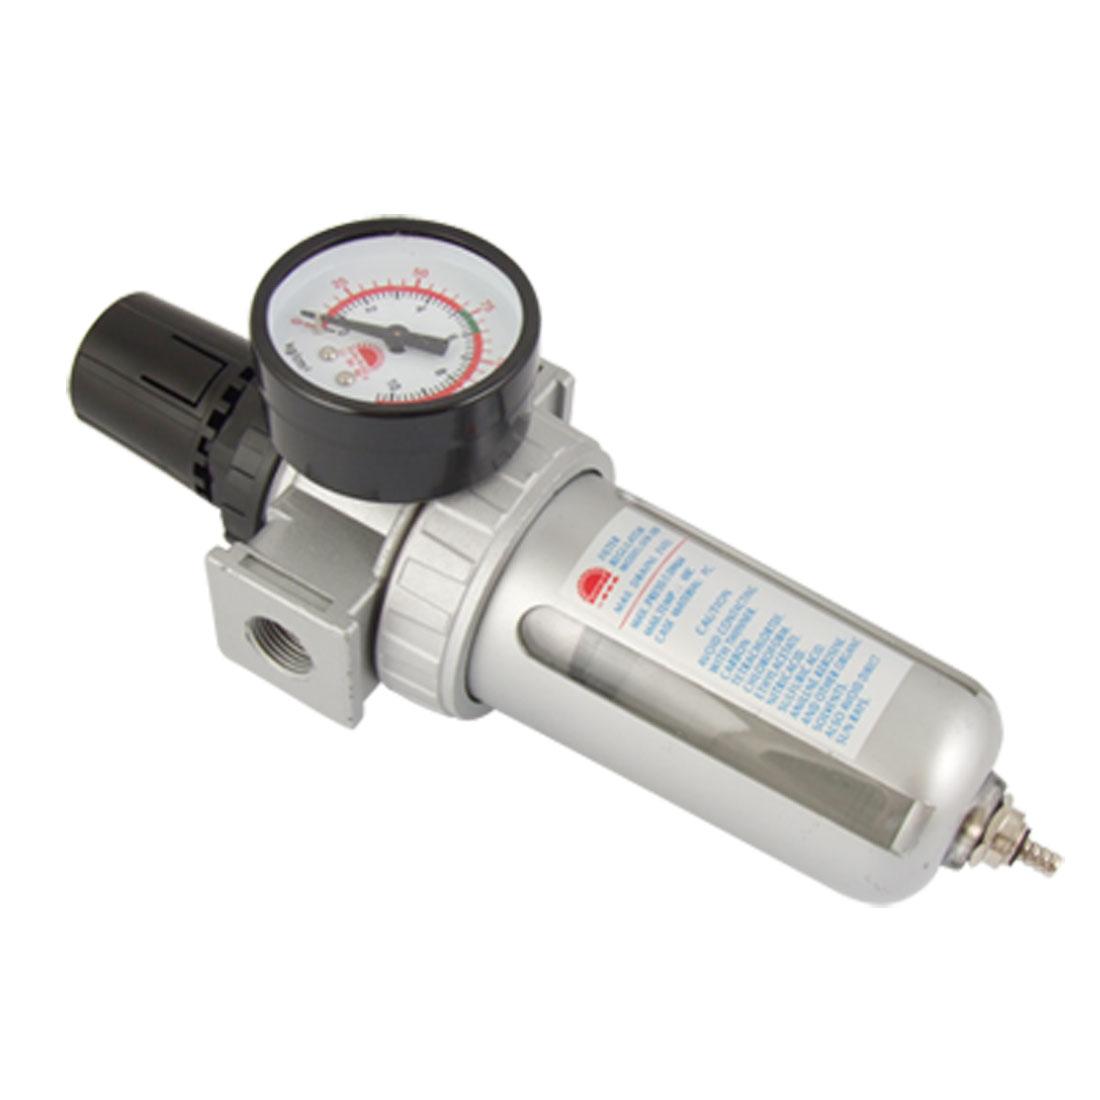 SFR300 Pneumatic Air Filter Gas Source Treatment w Pressure Gauge